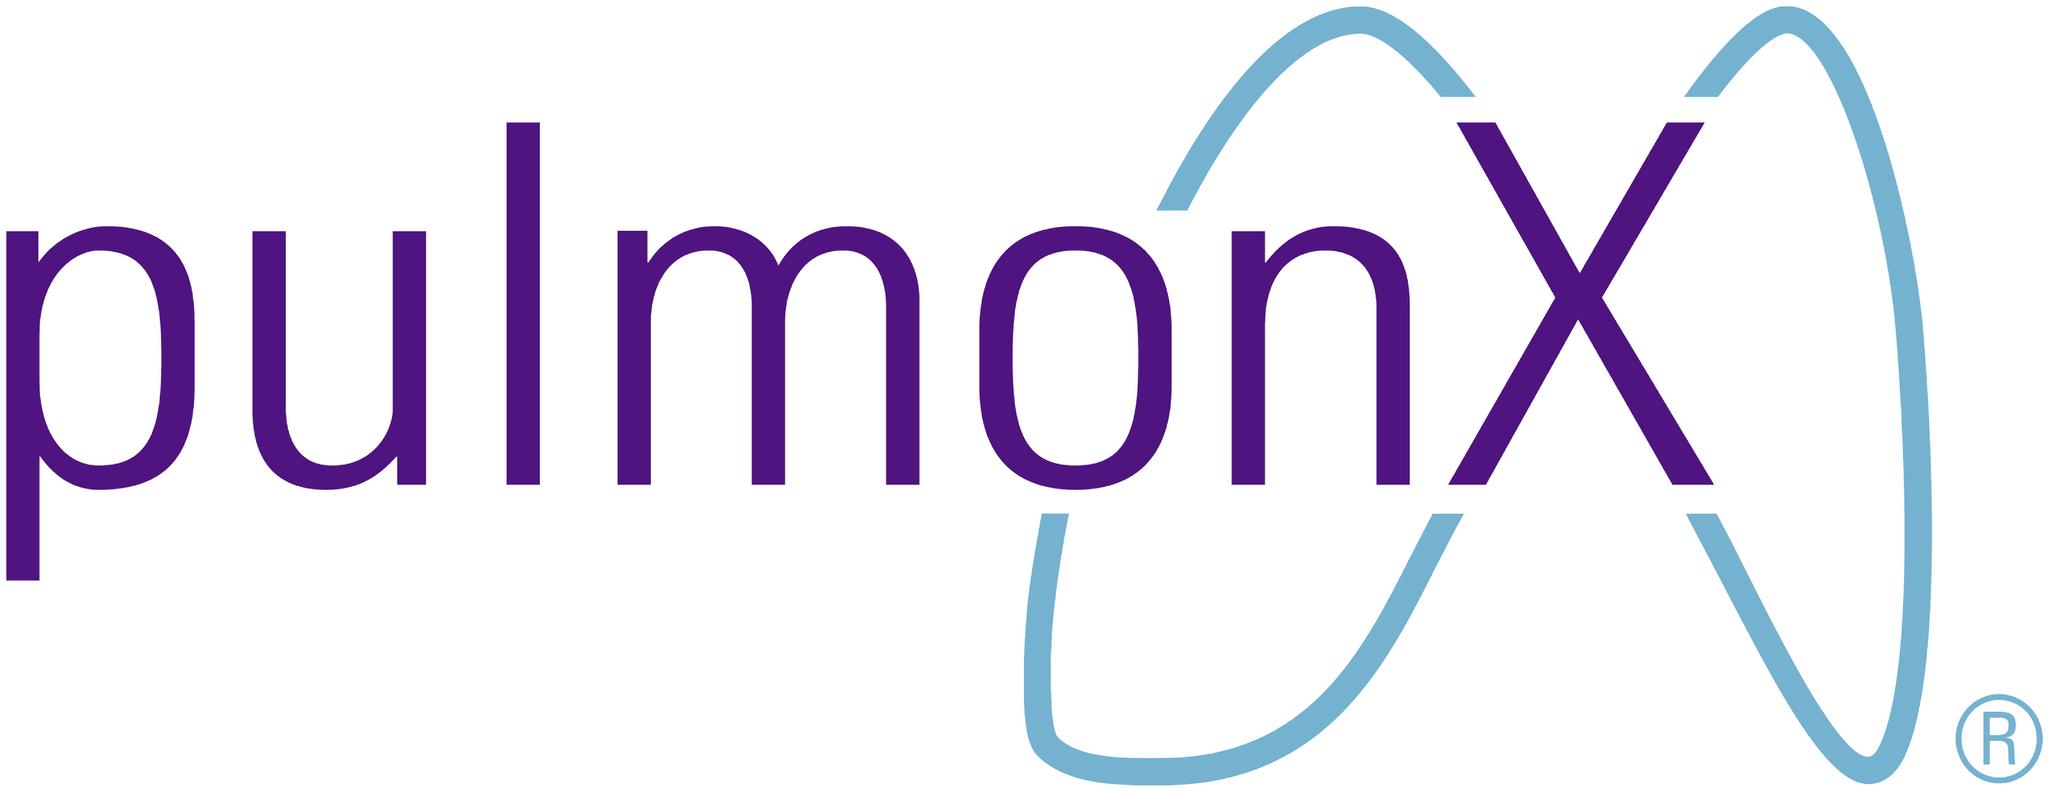 Pulmonx